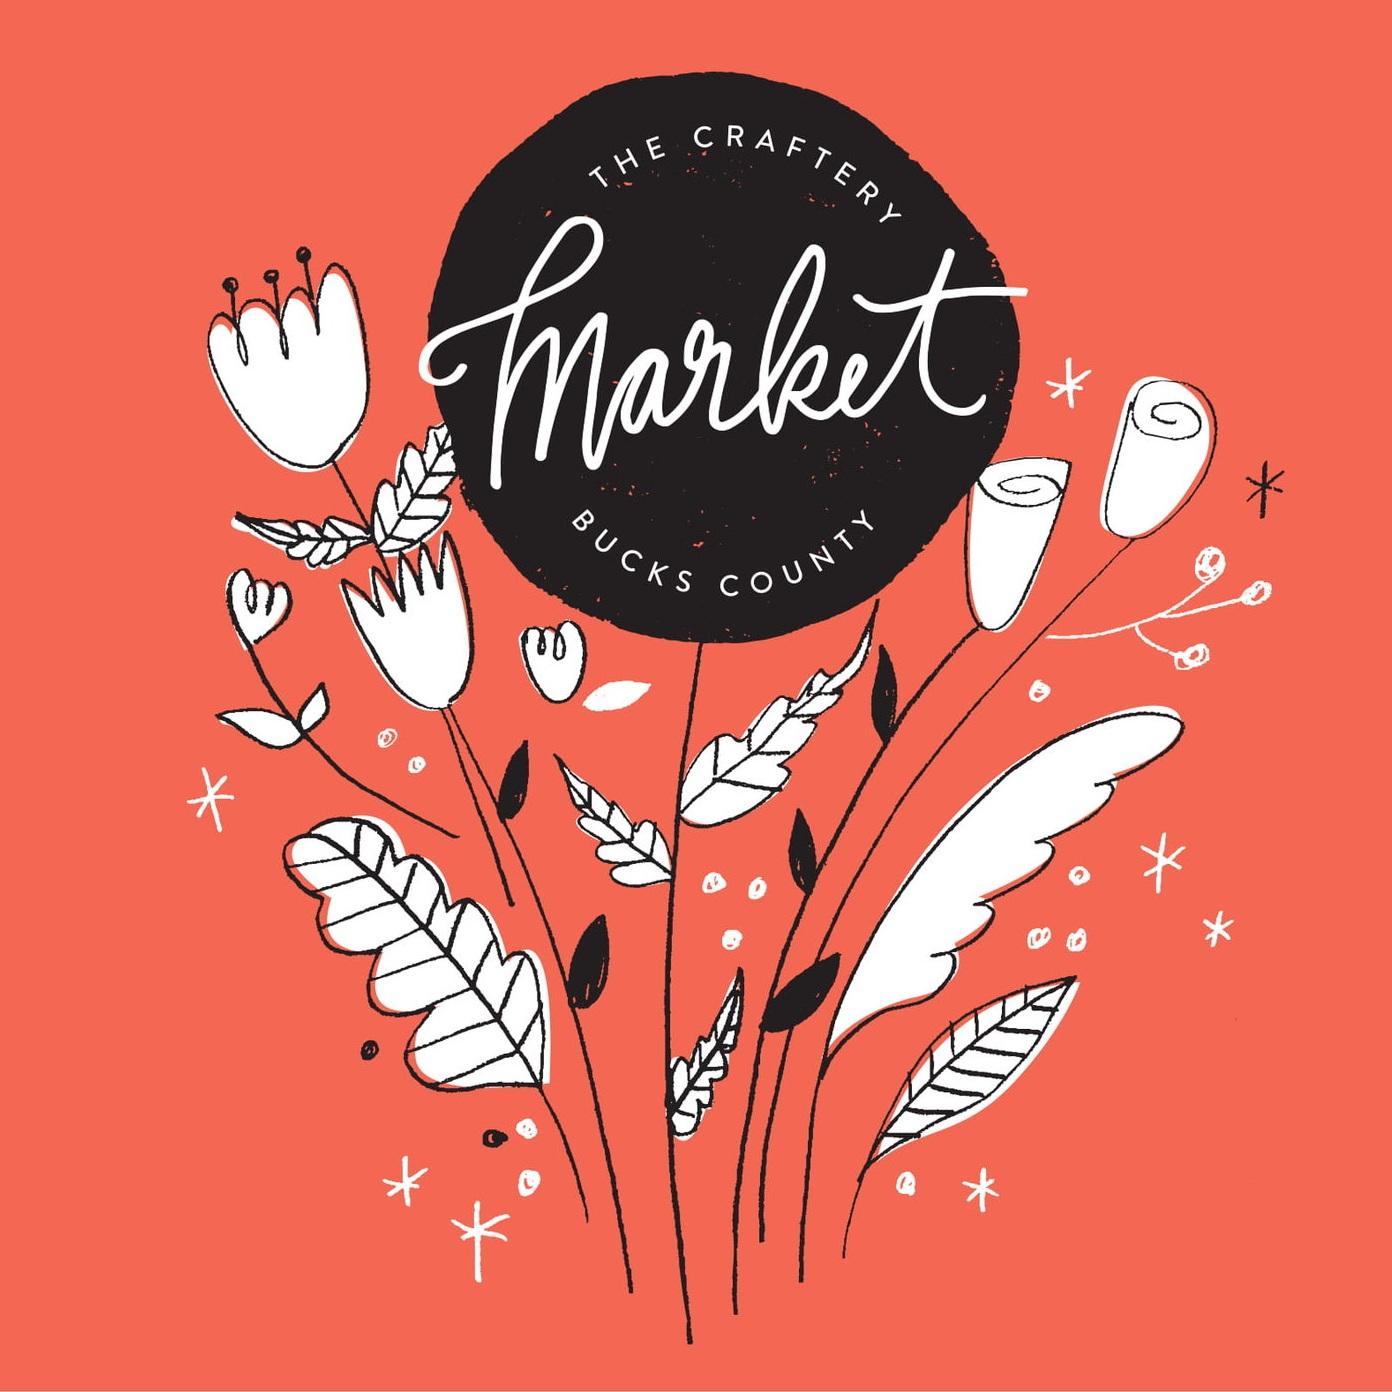 CrafteryMarket-Spring2019-1%2B%281%29.jpg